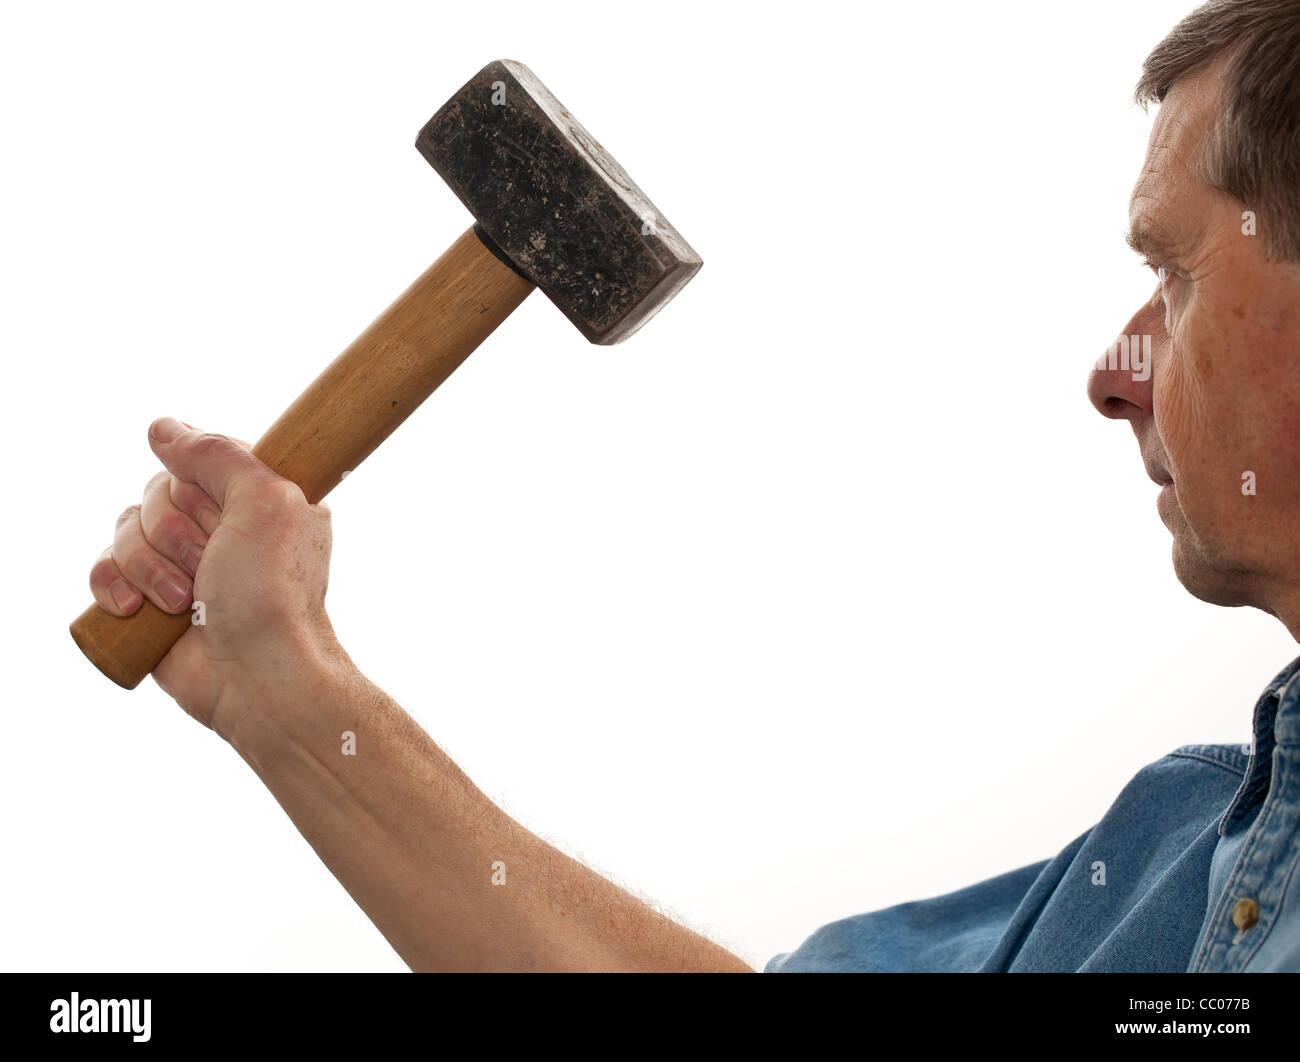 Hombre sujetando un gran trozo de martillo contra un blanco aislado Imagen De Stock